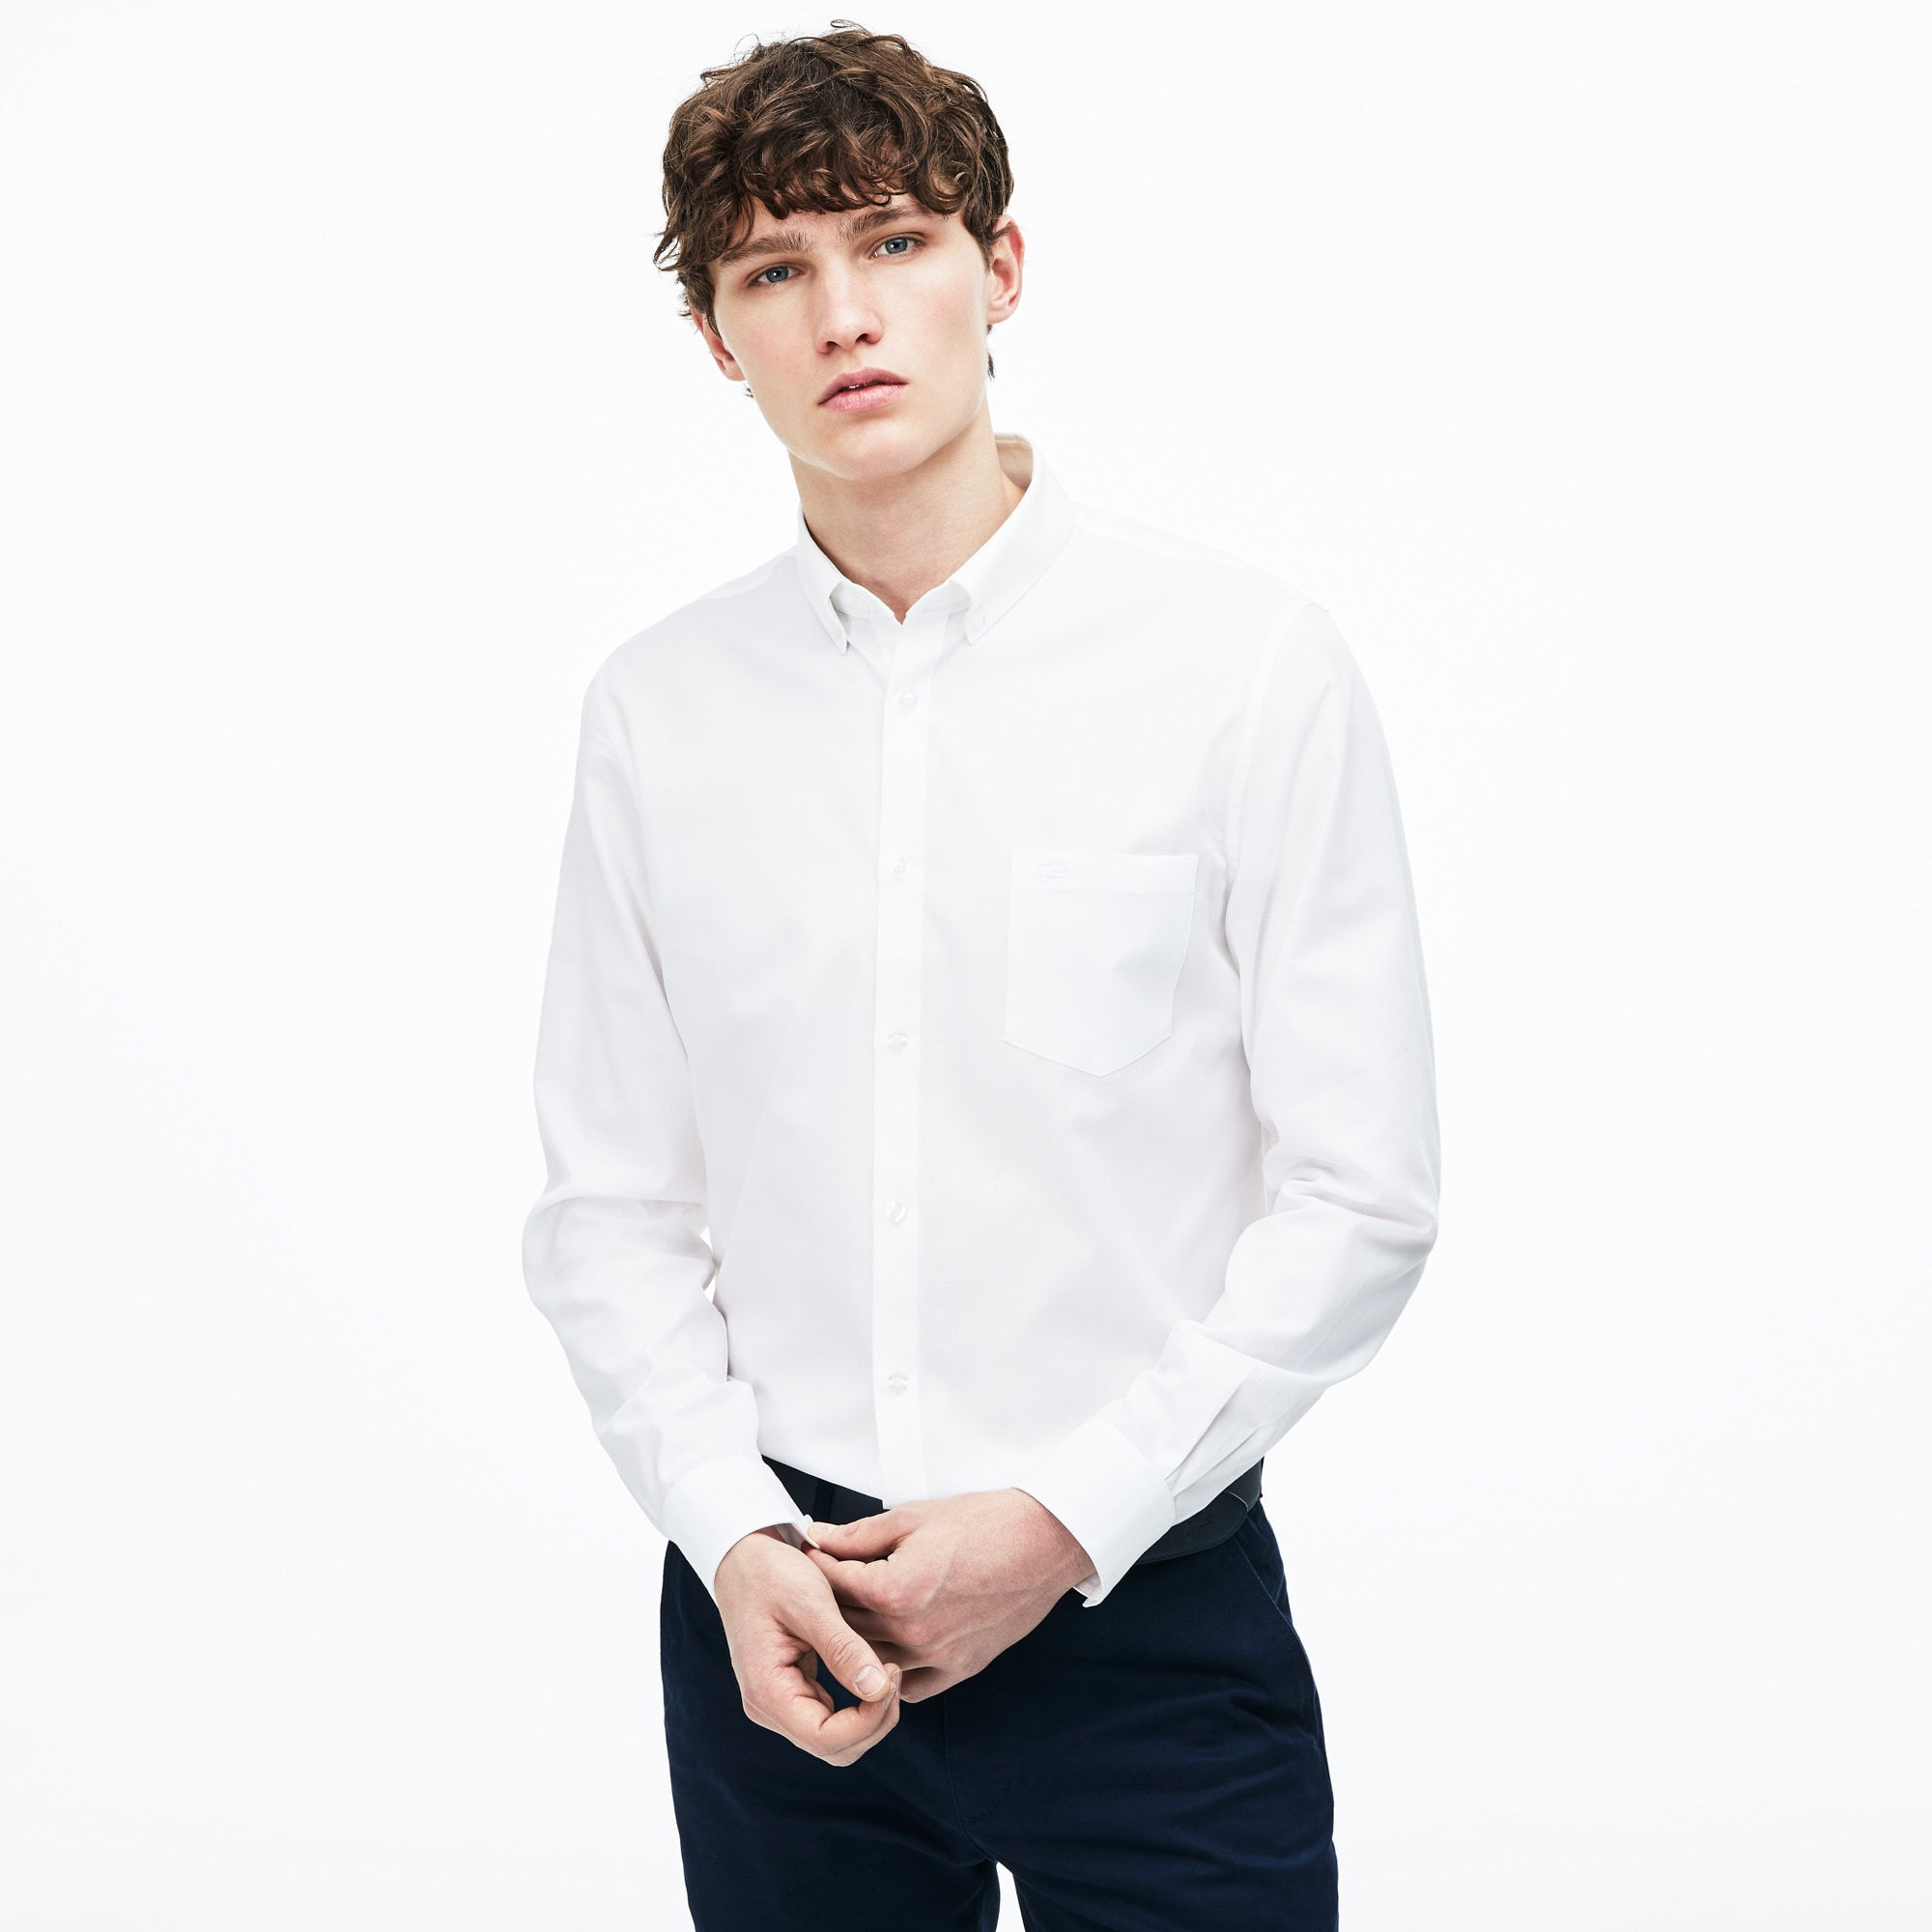 Lacoste - Regular Fit Herren-Hemd aus strukturierter Popeline - 1